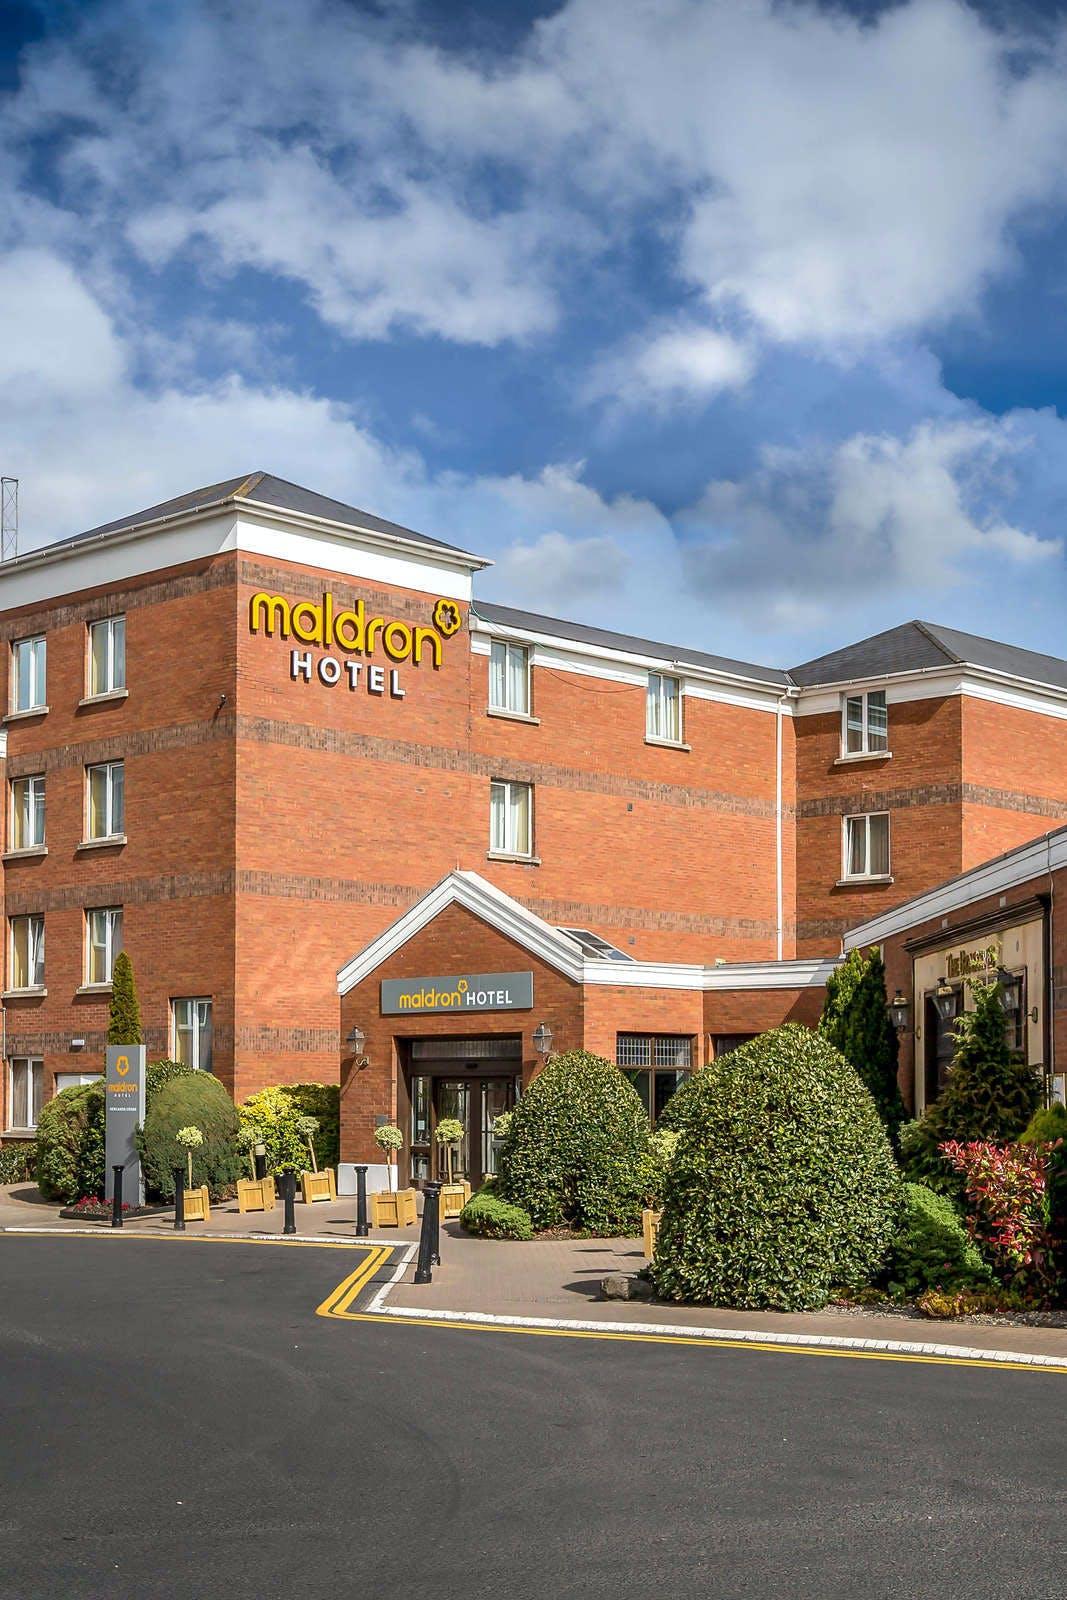 Maldron Hotel Newlands Cross